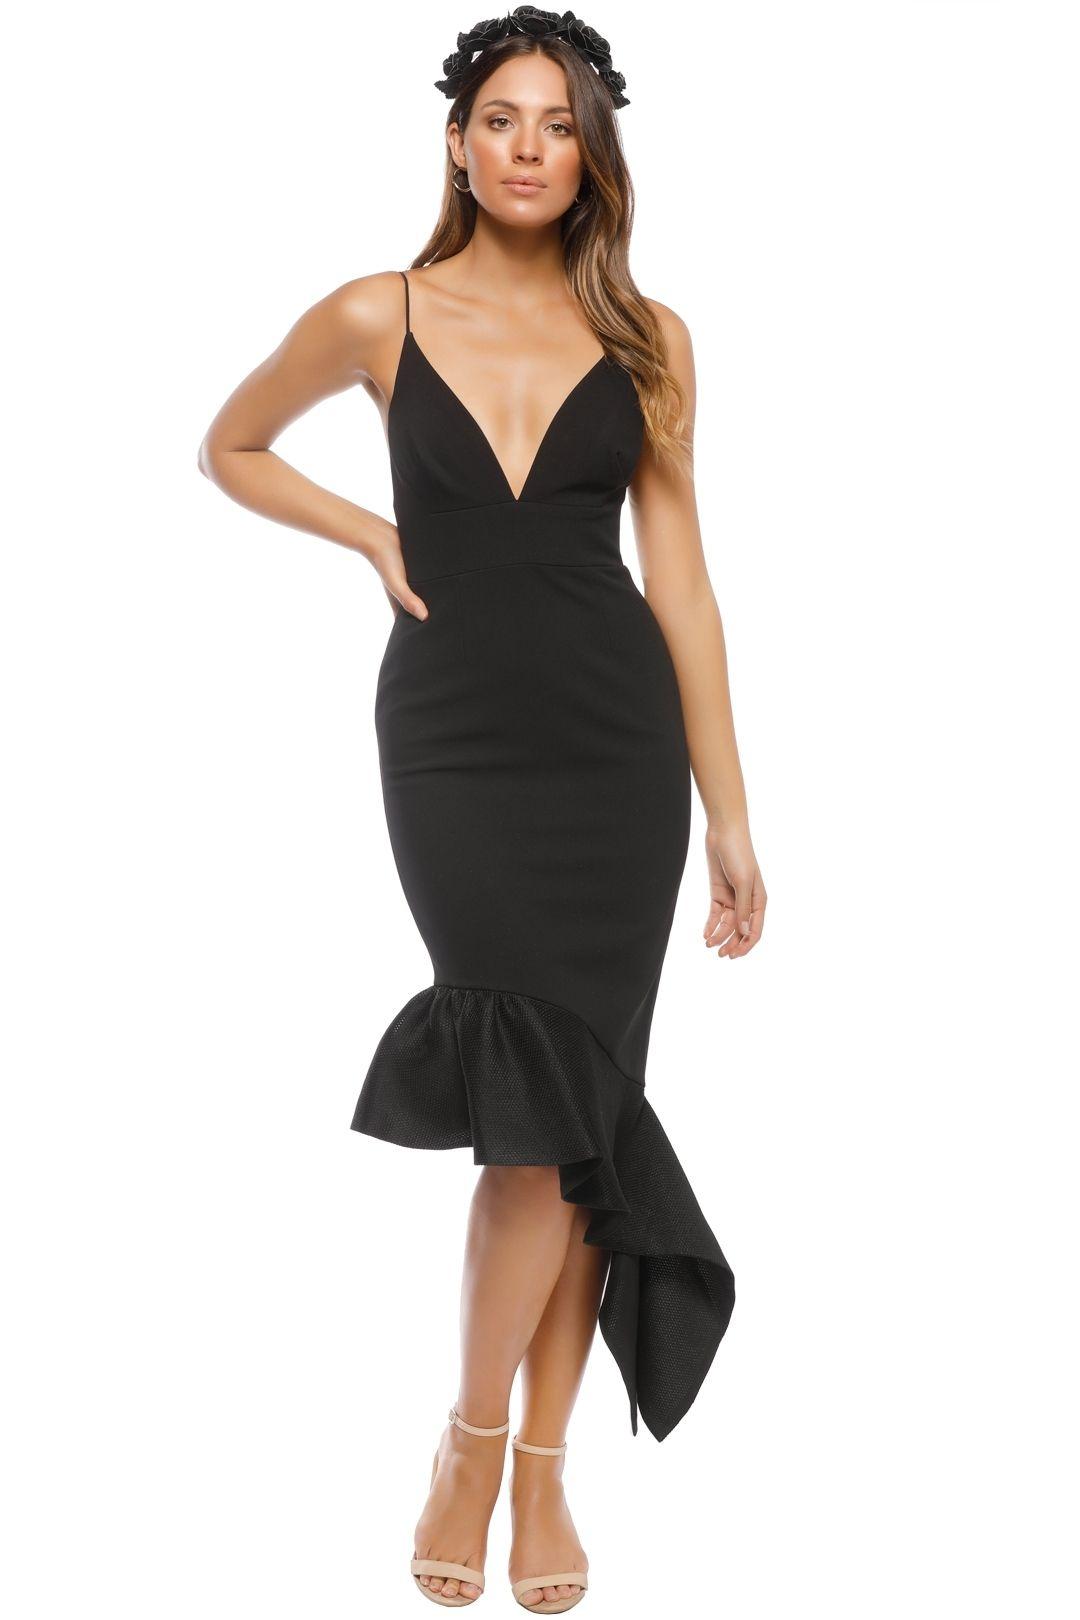 Talulah - Renegade Midi Dress - Black - Front